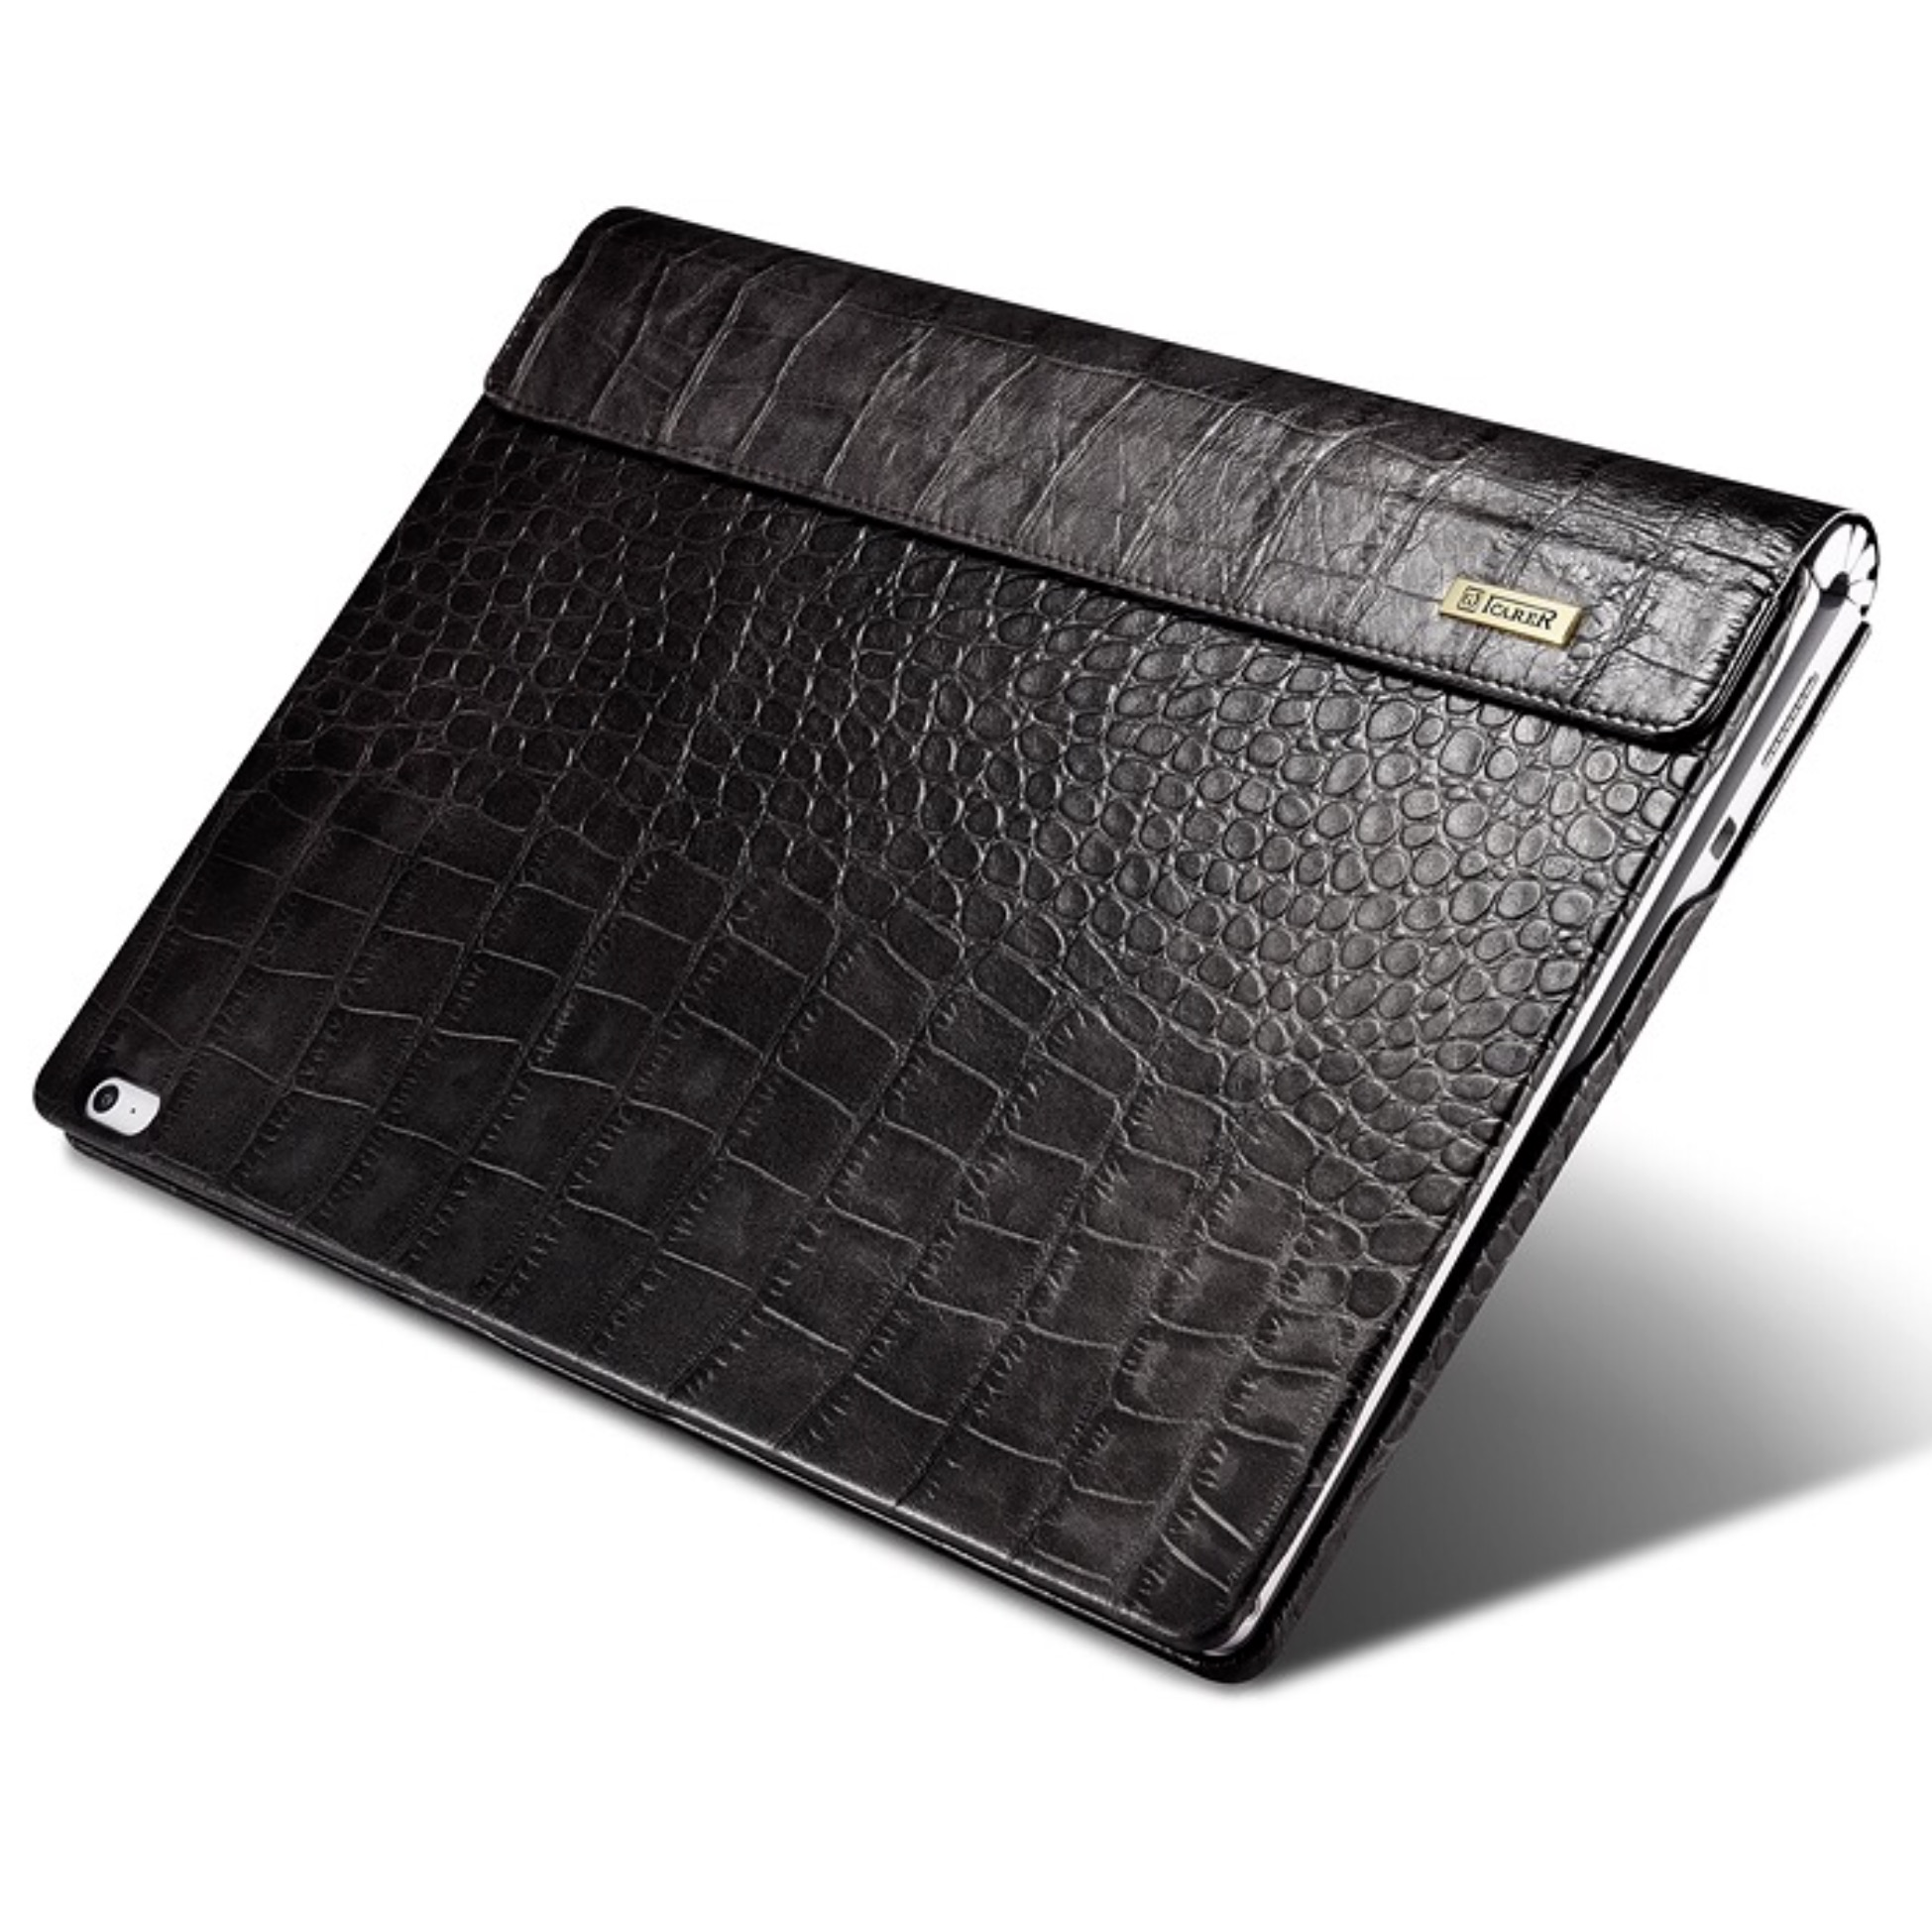 Etui Folio cuir Surface BOOK 2 de 2e Génération 13.5 pouces ... fed68cebafc